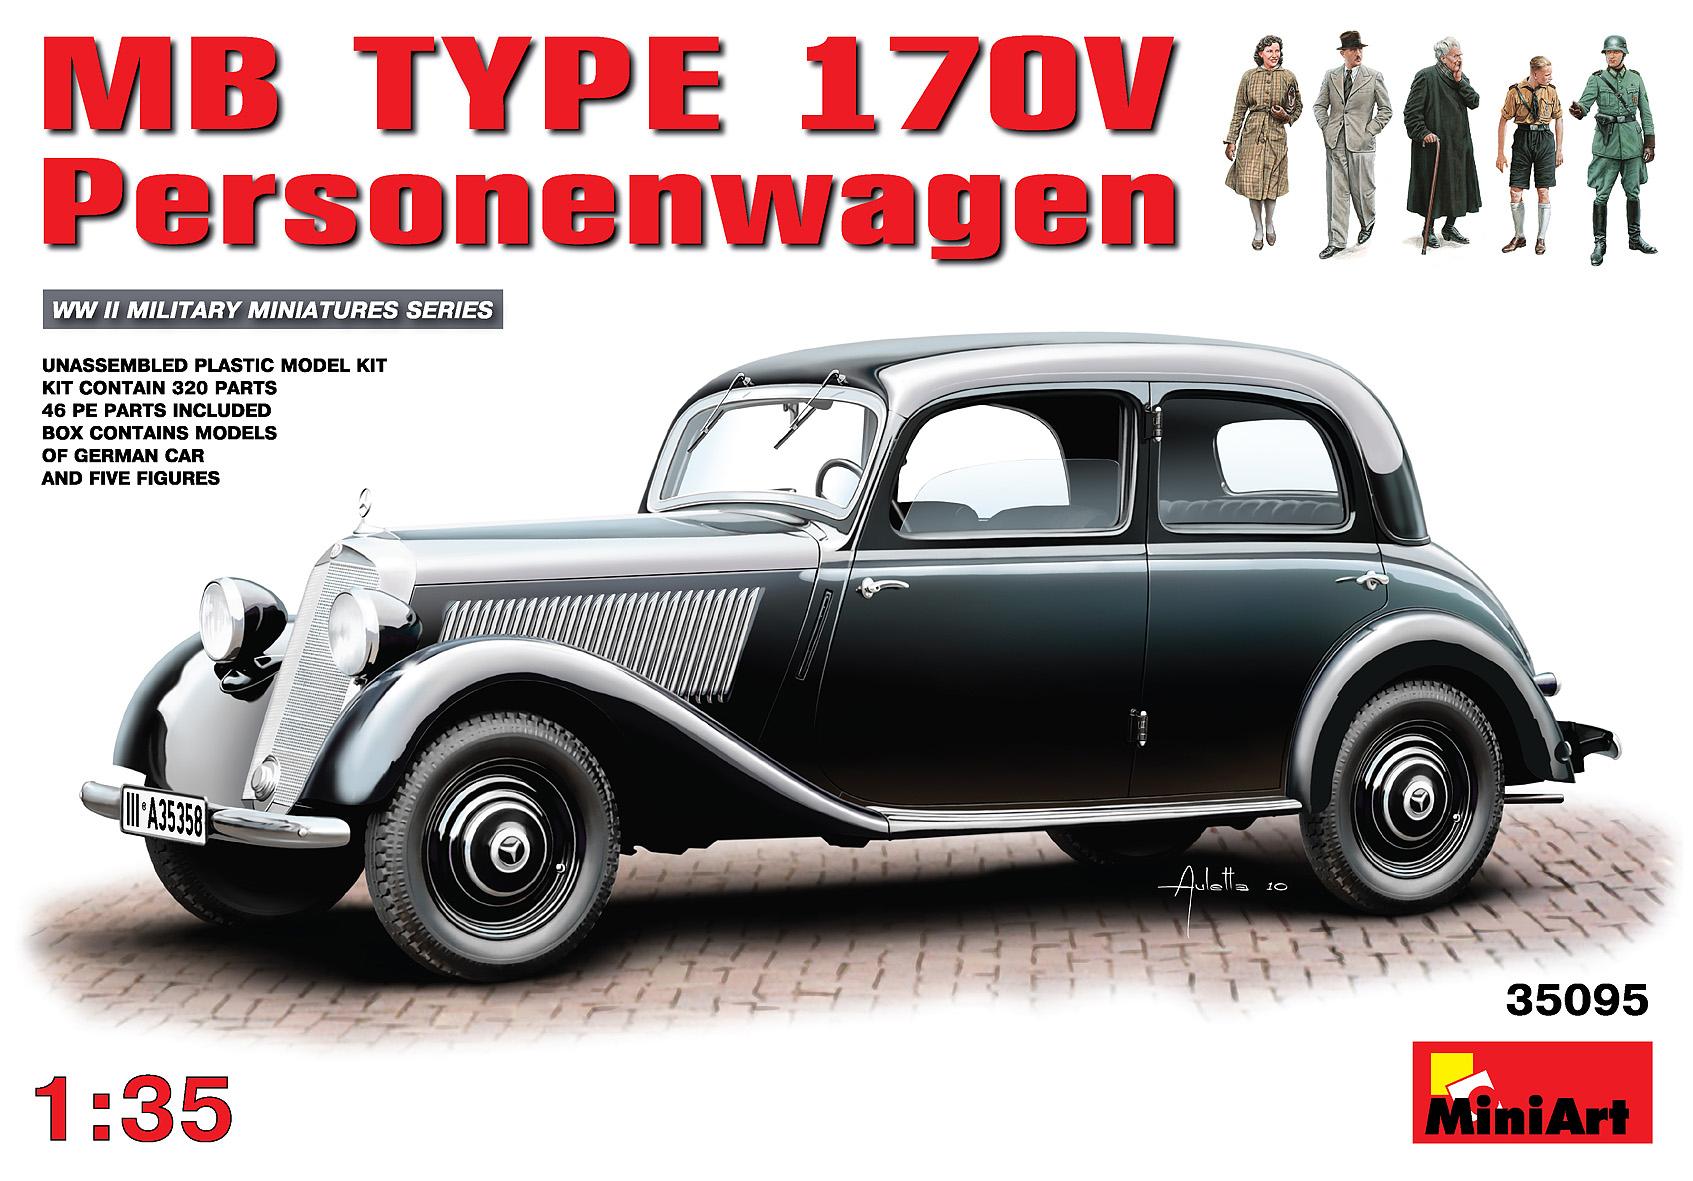 35095 MB TYPE 170V Personenwagen